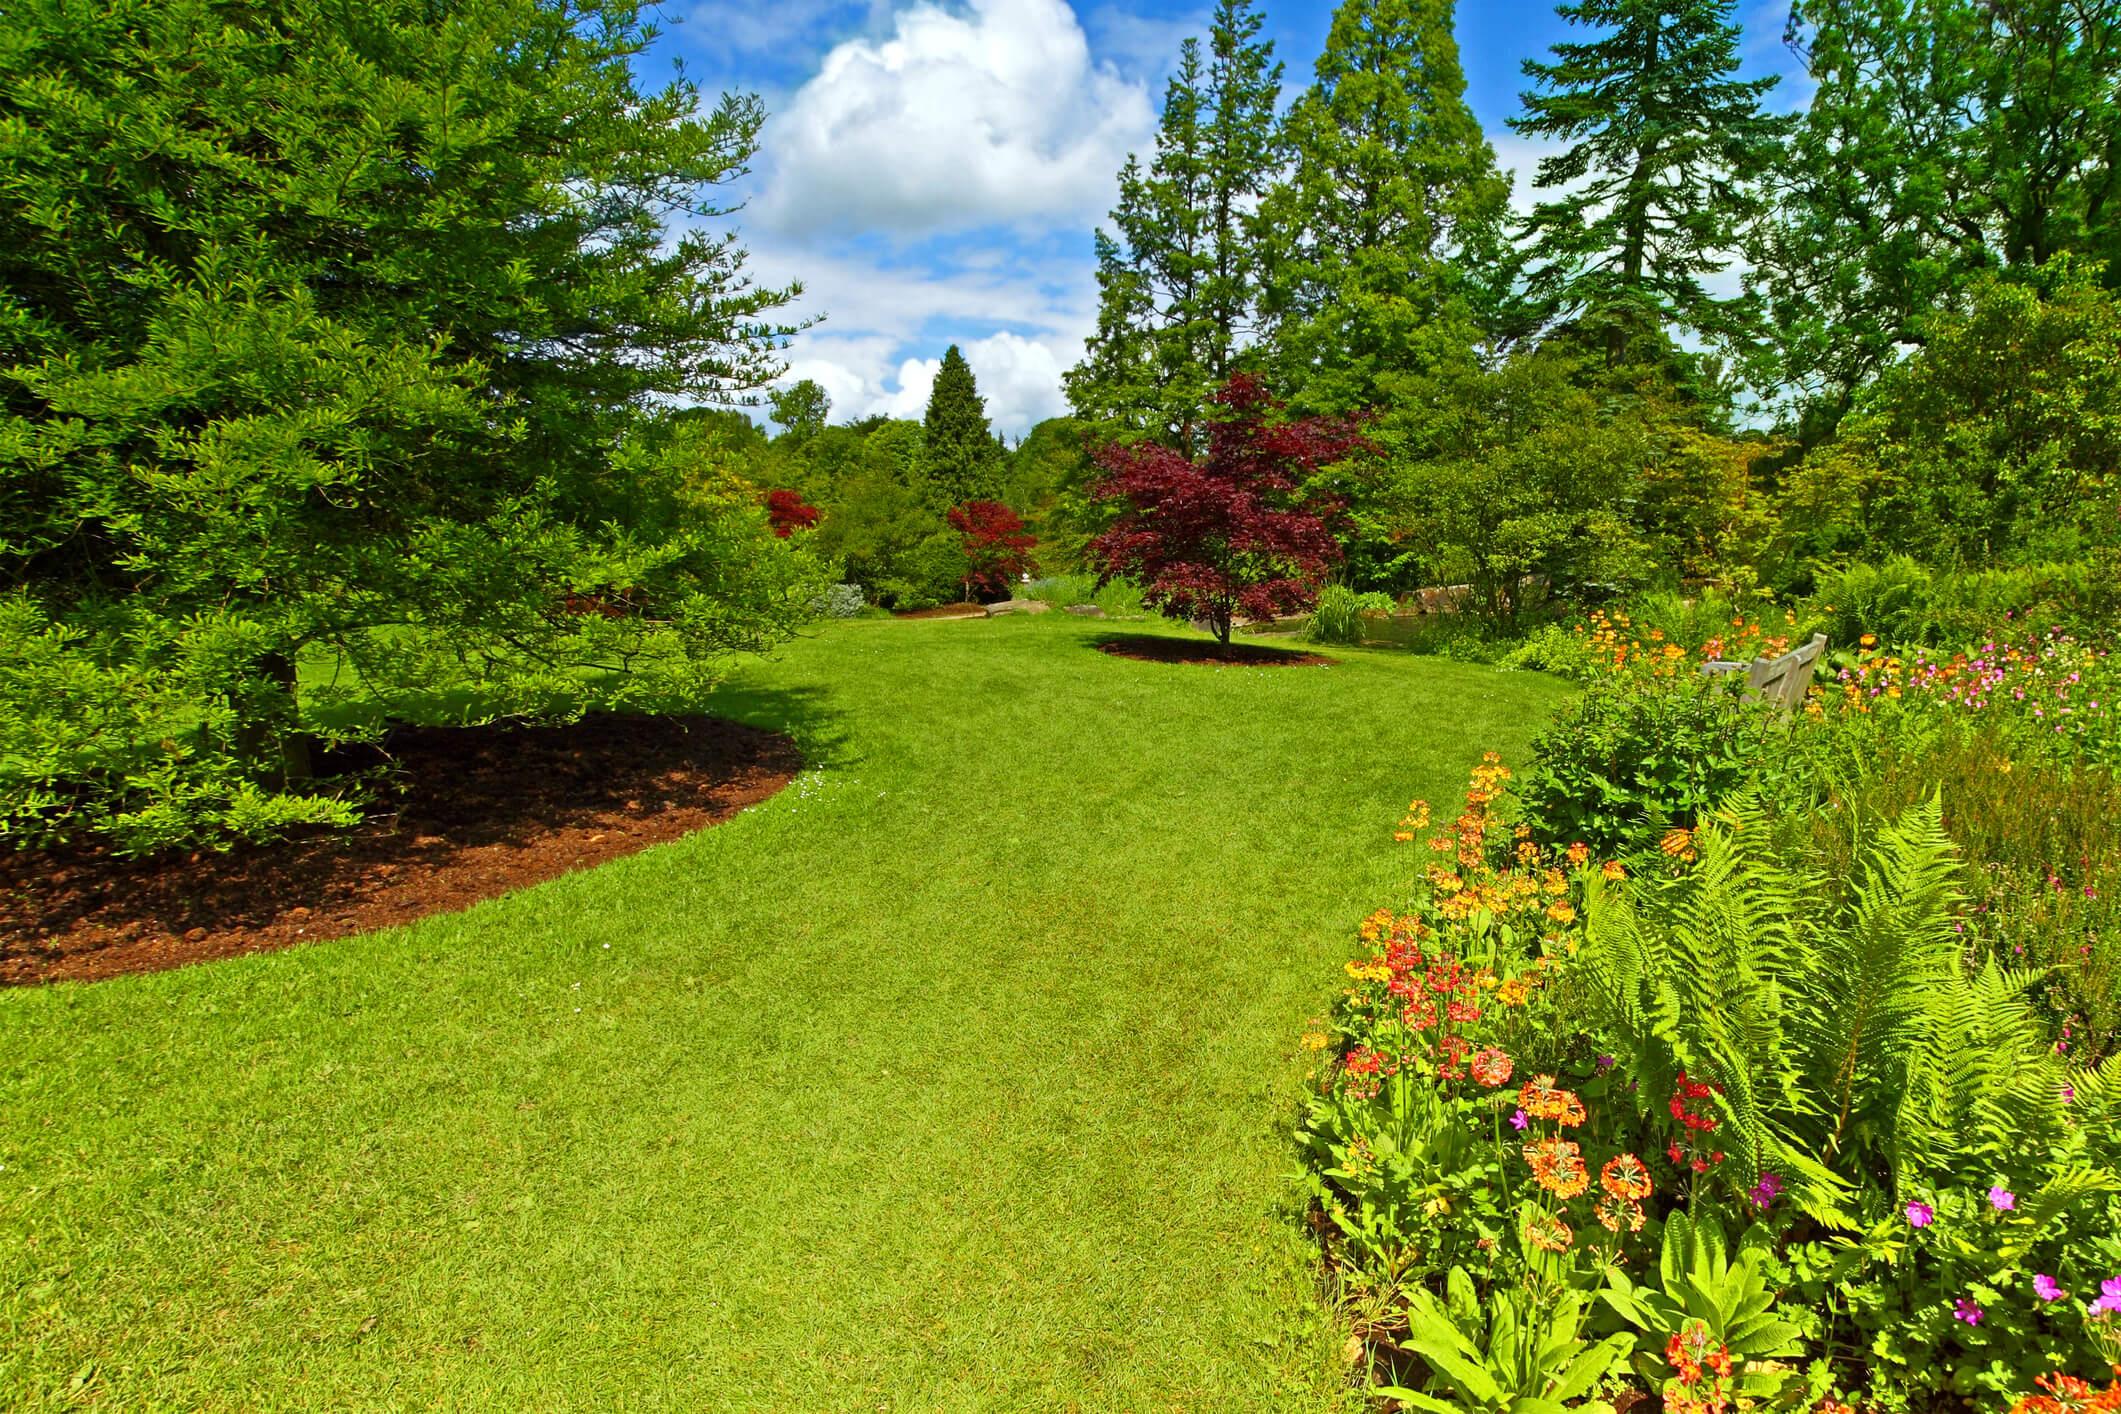 Garden landscaping, Srpingtime, on sunny day.